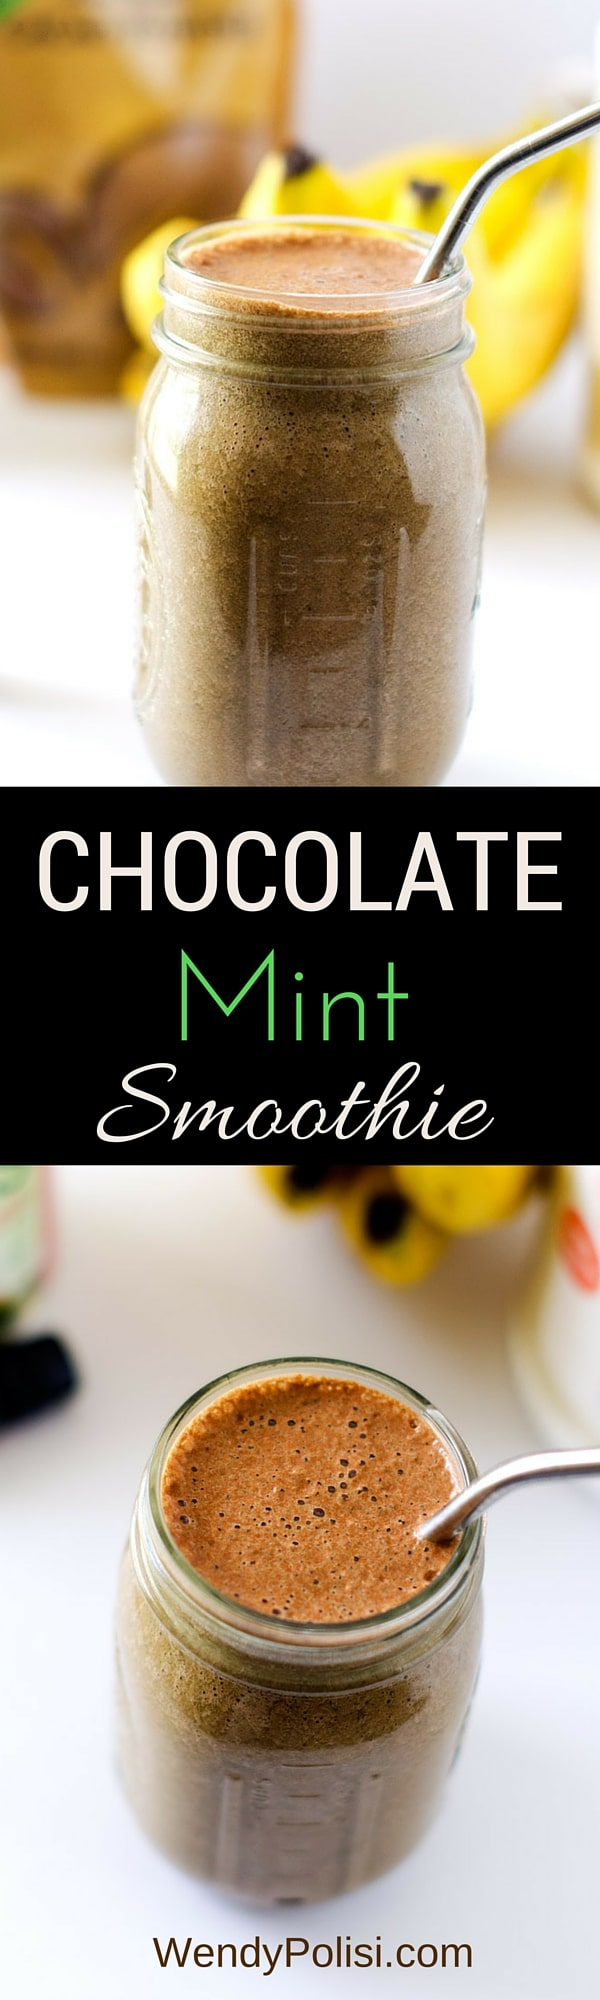 Chocolate Mint Smoothie